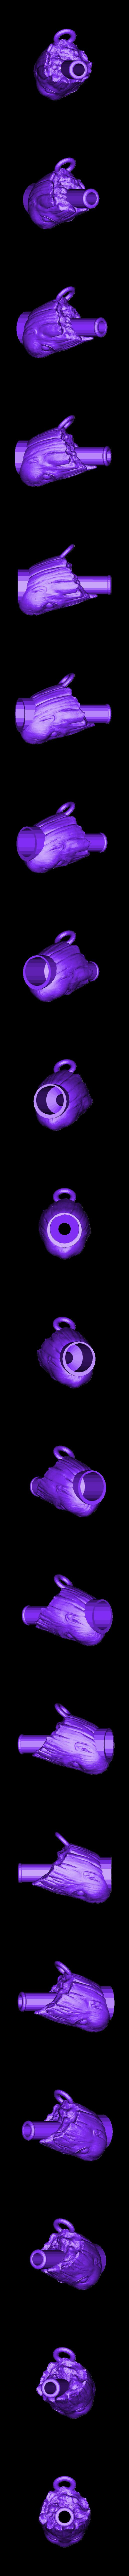 BoquillaGroot.stl Descargar archivo STL gratis Boquilla Cachimba / Shisha Baby Groot • Plan de la impresora 3D, Shisha3D